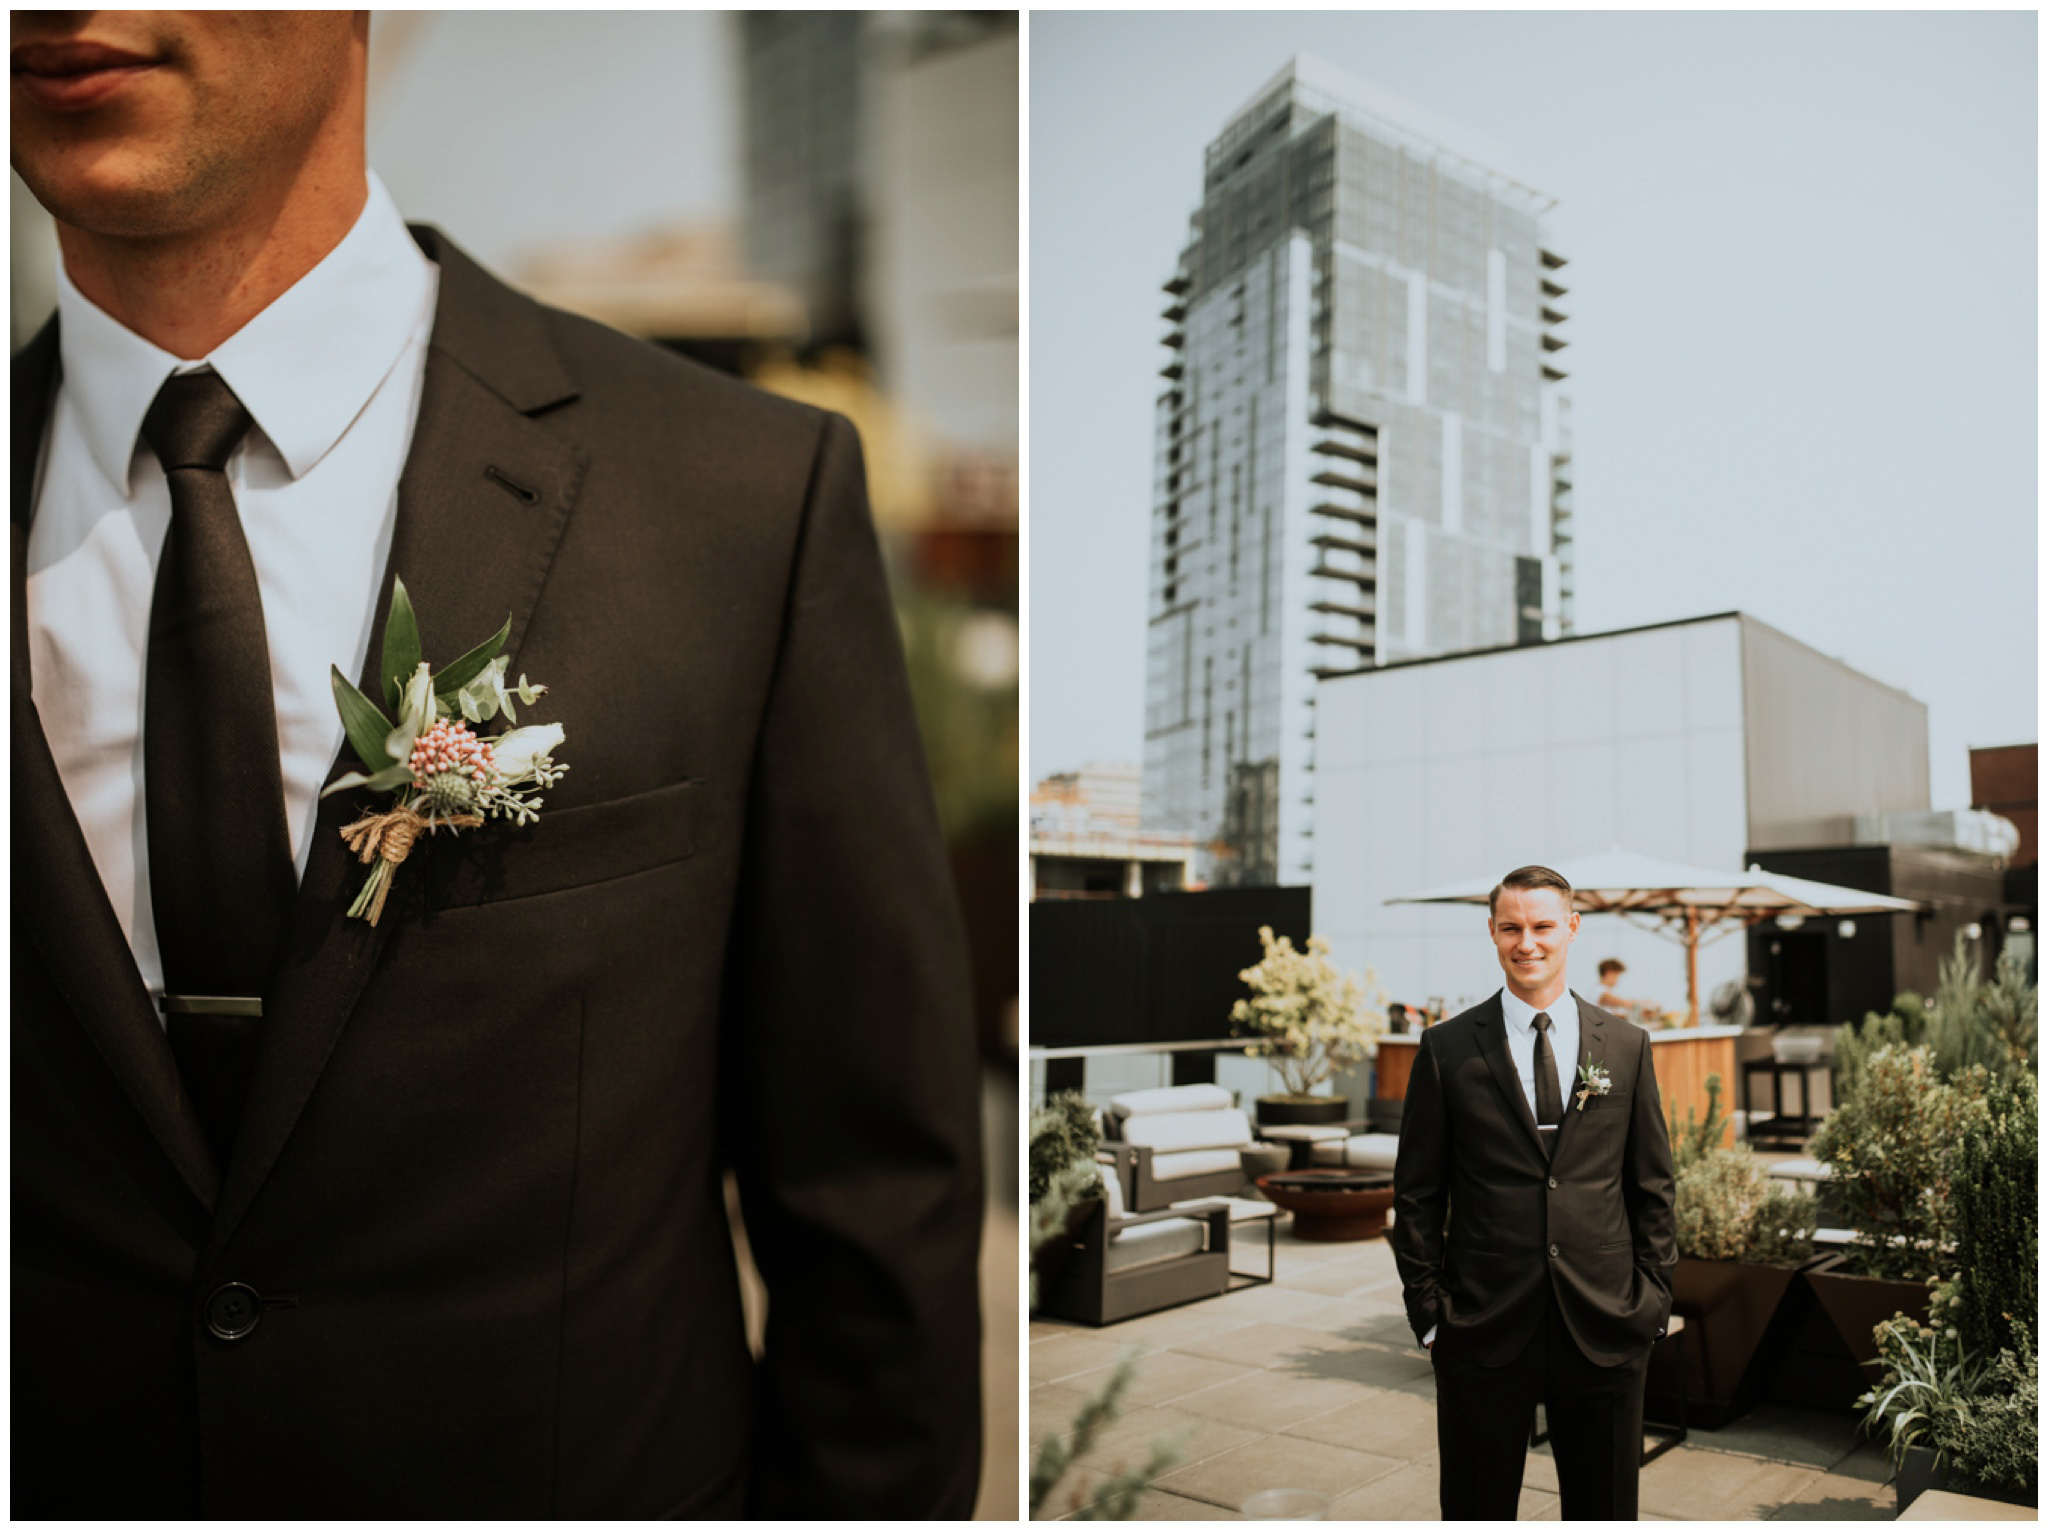 alyssa-keiran-westland-distillery-urban-seattle-wedding-photographer-caitlyn-nikula-45.jpg